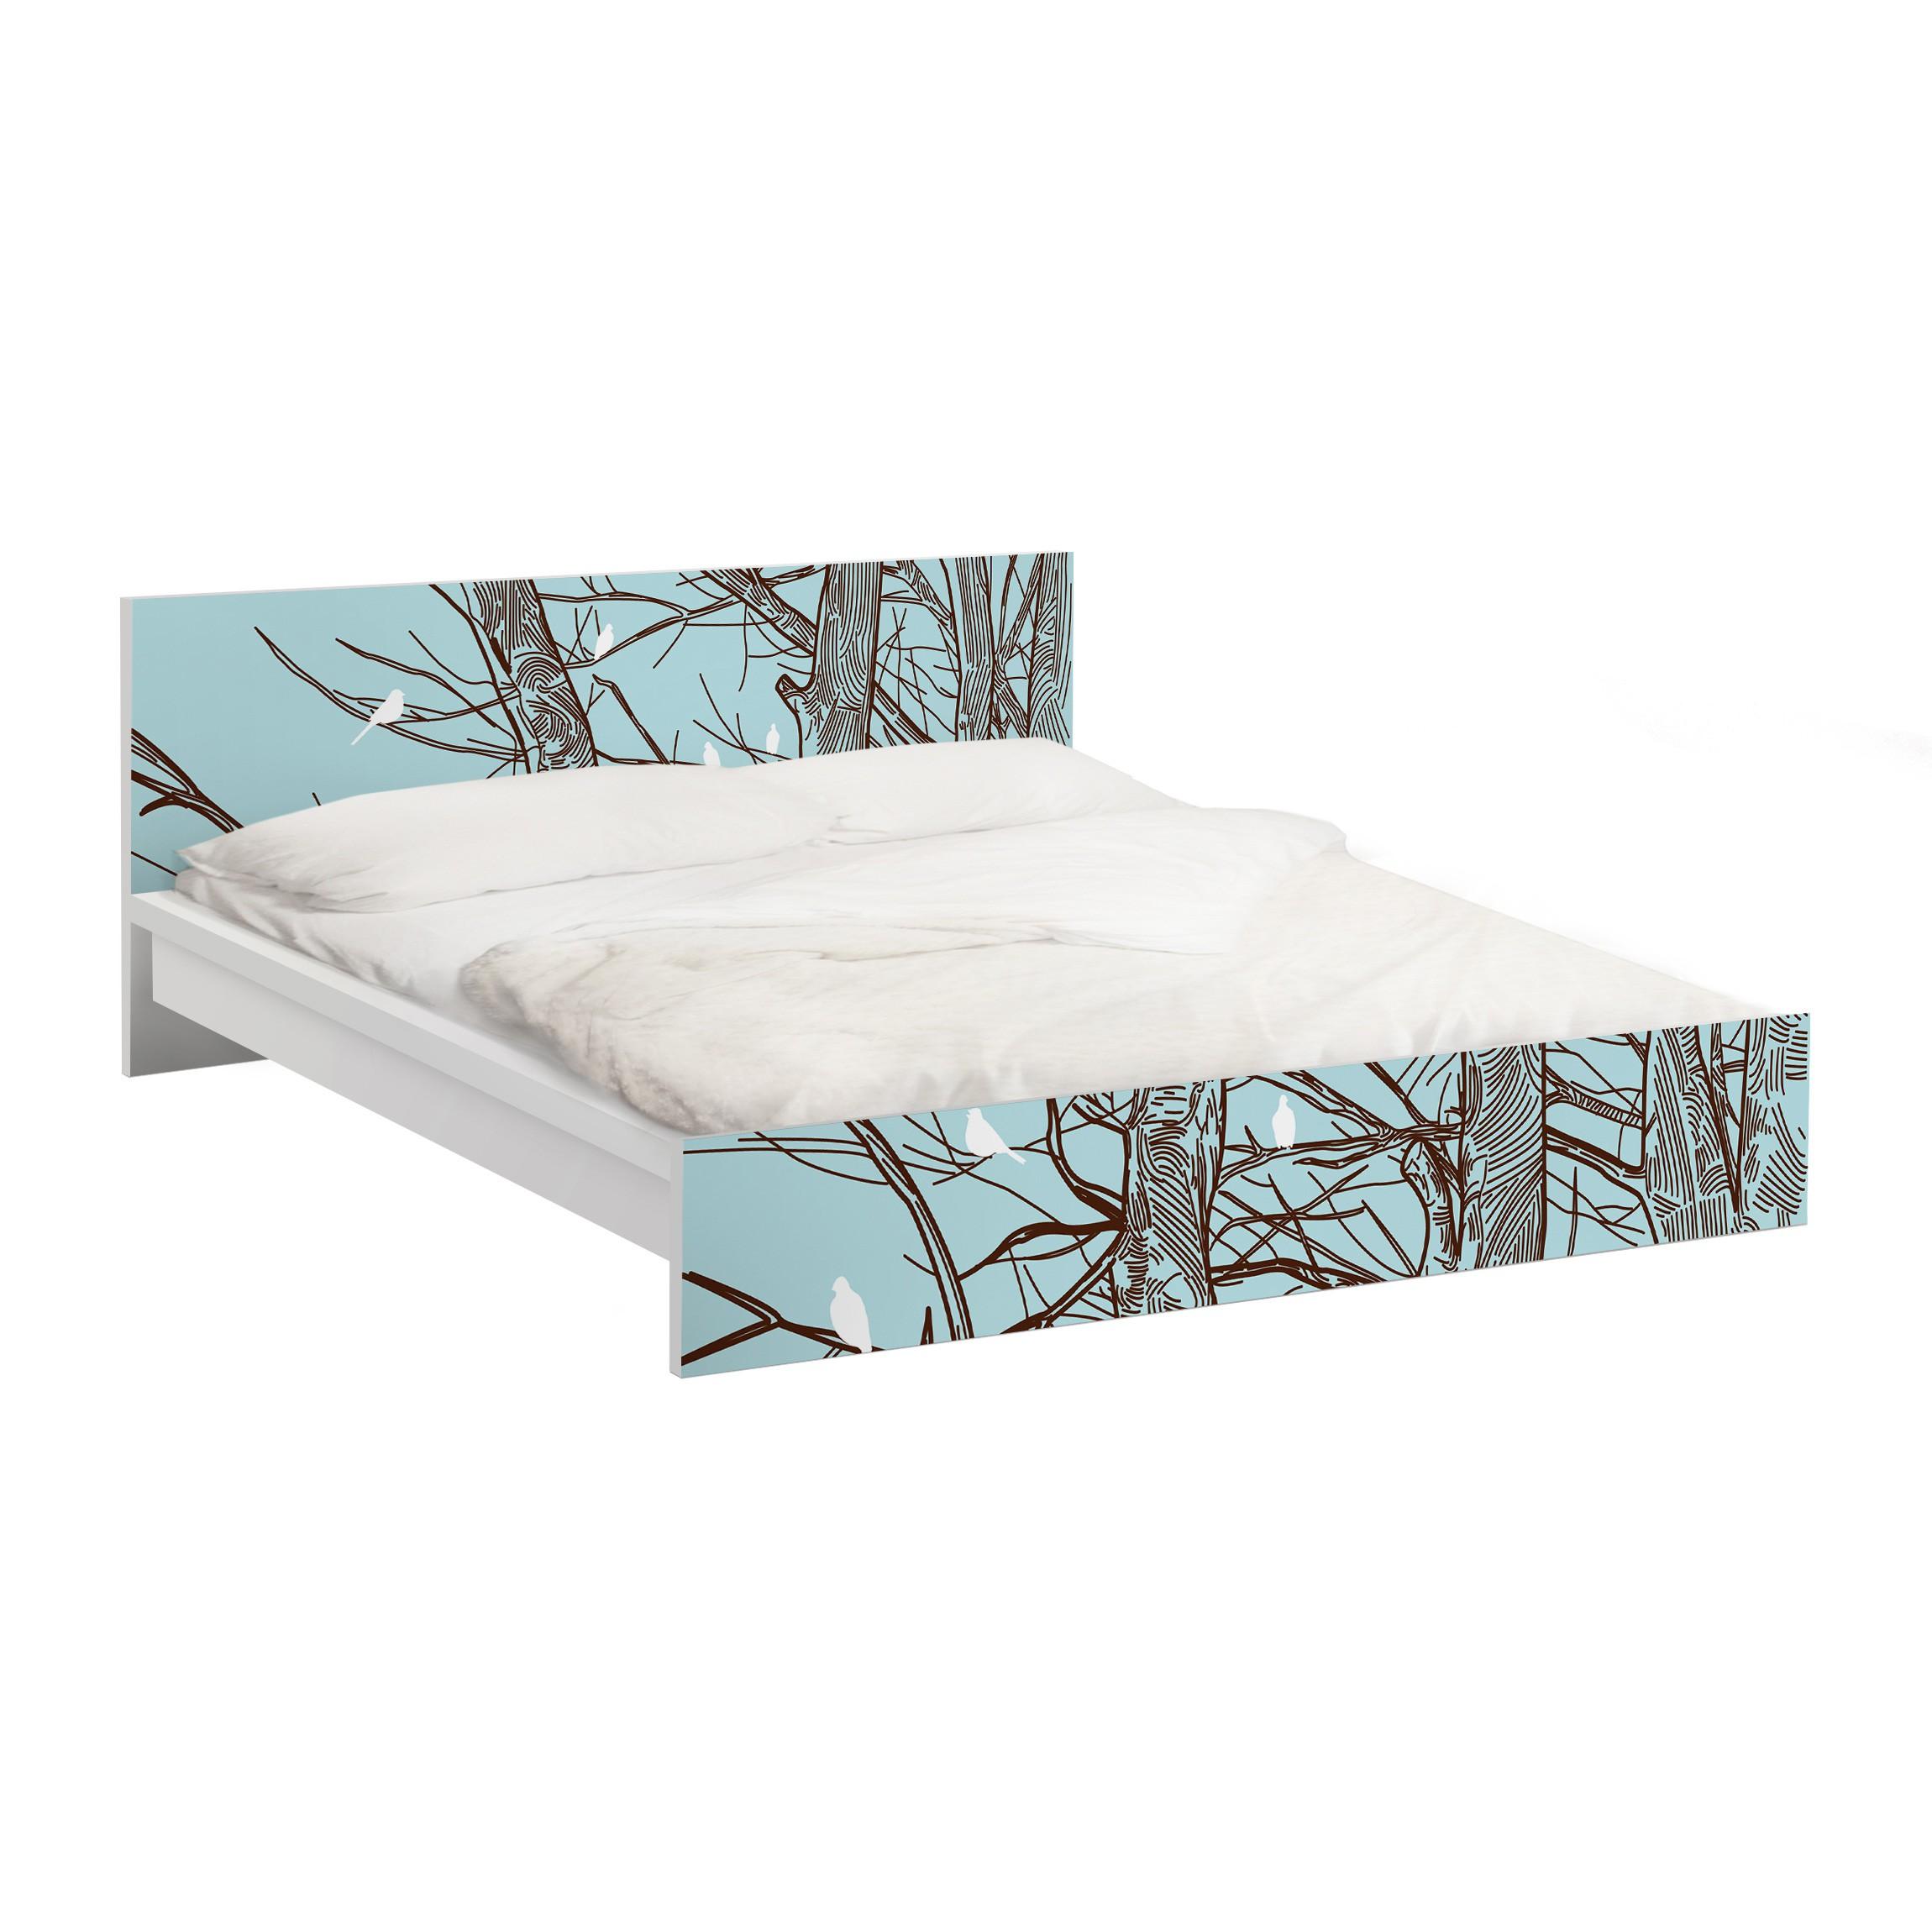 m belfolie f r ikea malm bett niedrig 180x200cm klebefolie winterb ume. Black Bedroom Furniture Sets. Home Design Ideas